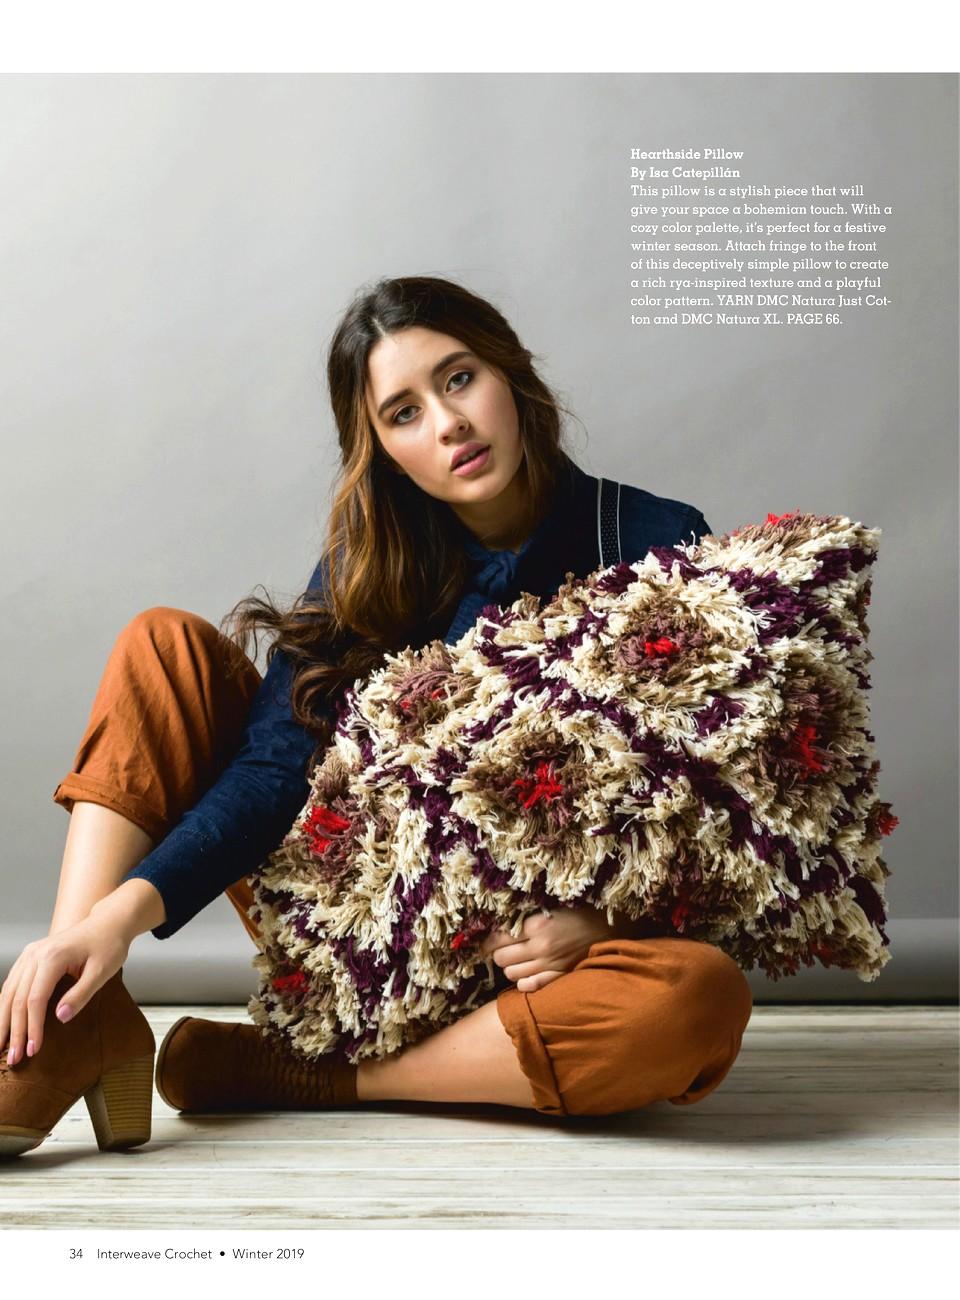 Interweave Crochet Winter 2019-35